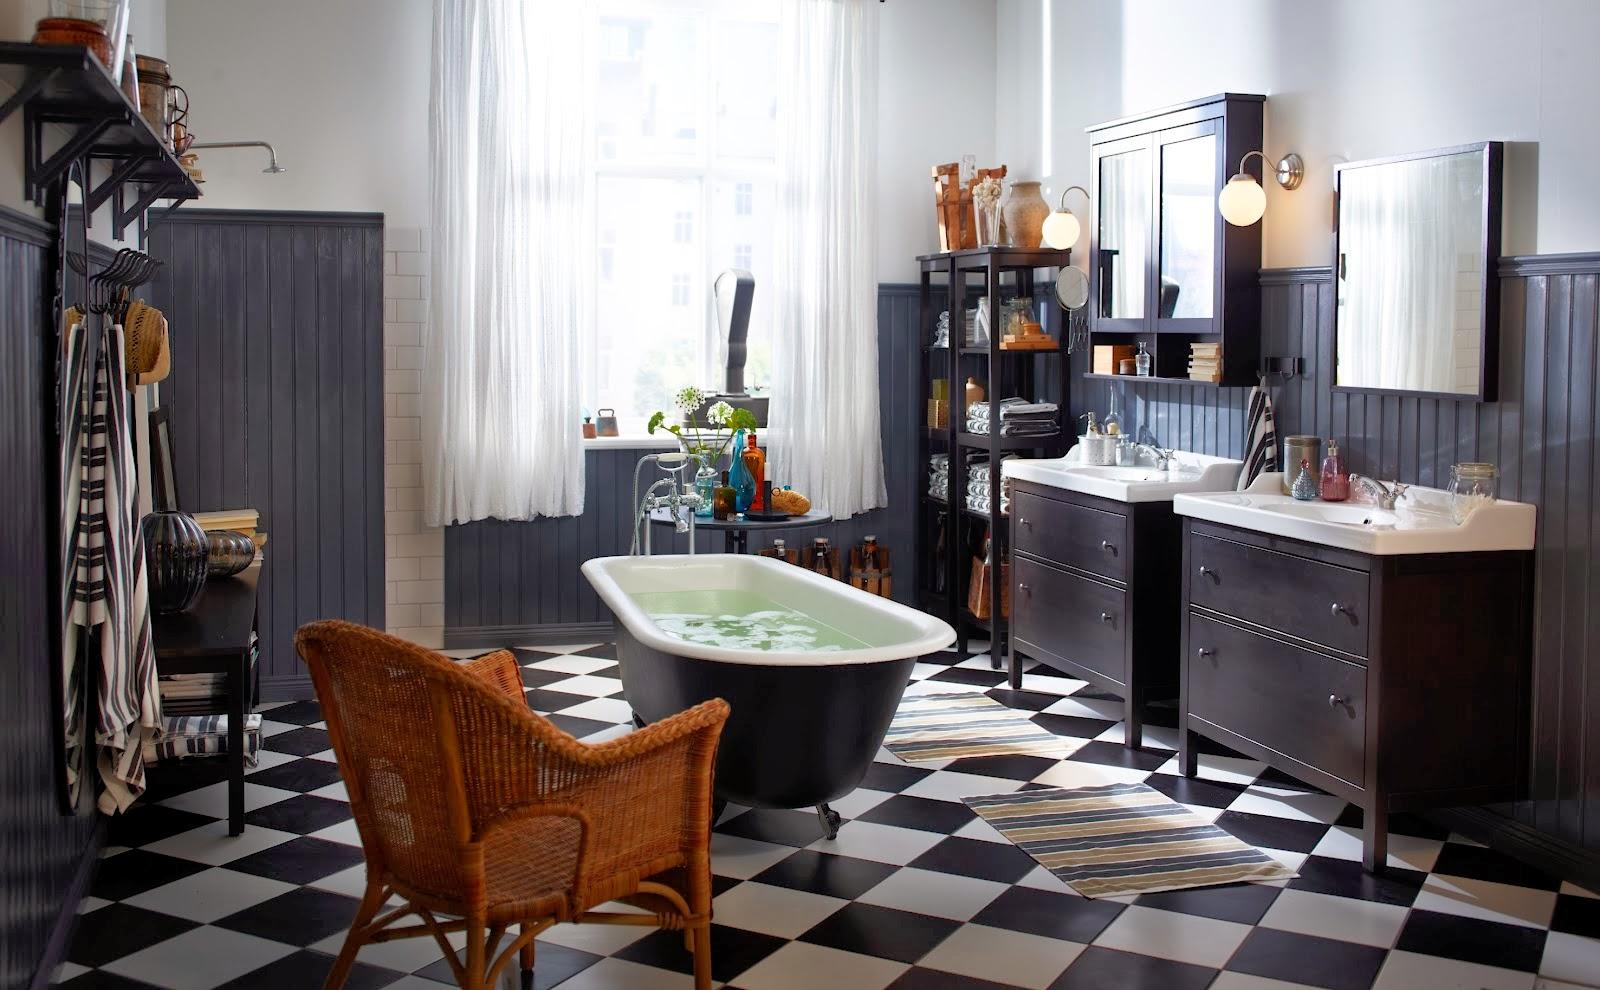 Livet på säludden: litet badrum